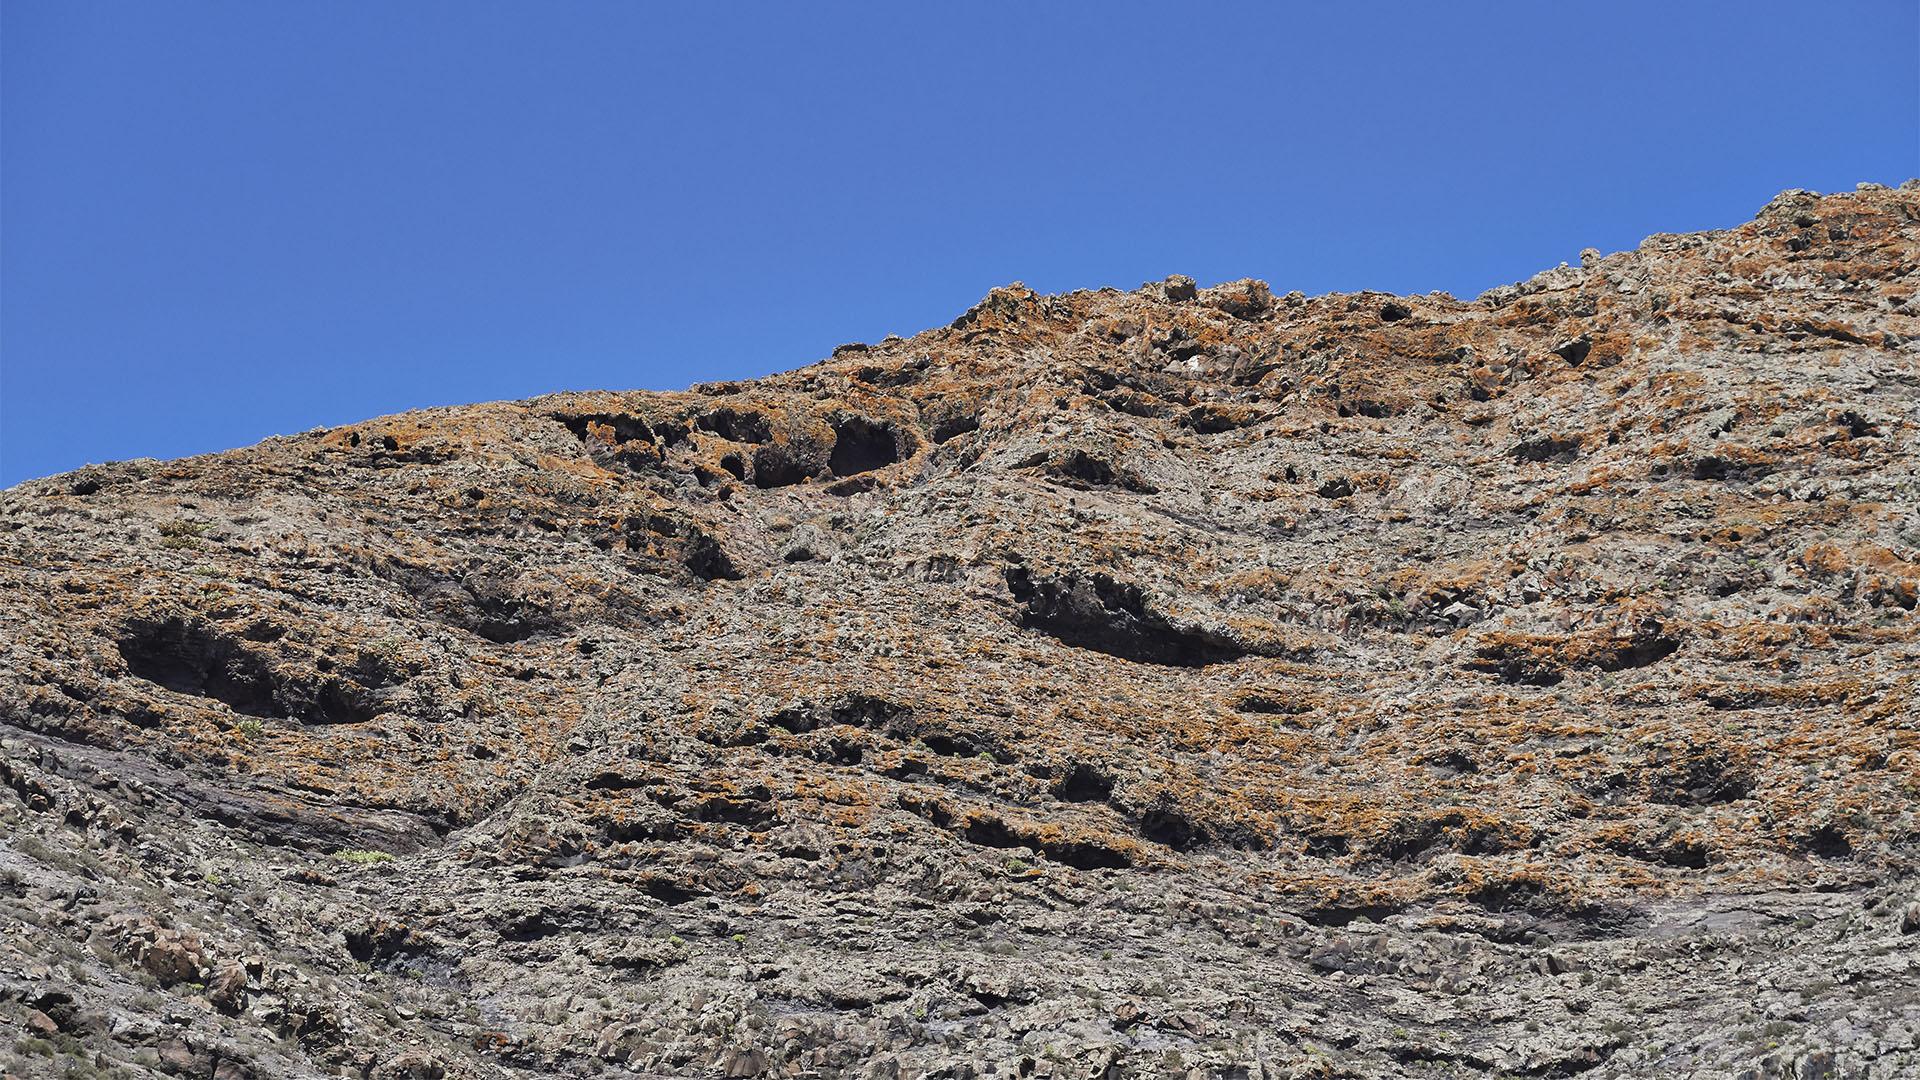 Die Höhlen in der Westwand des Montaña de la Muda Fuerteventura.